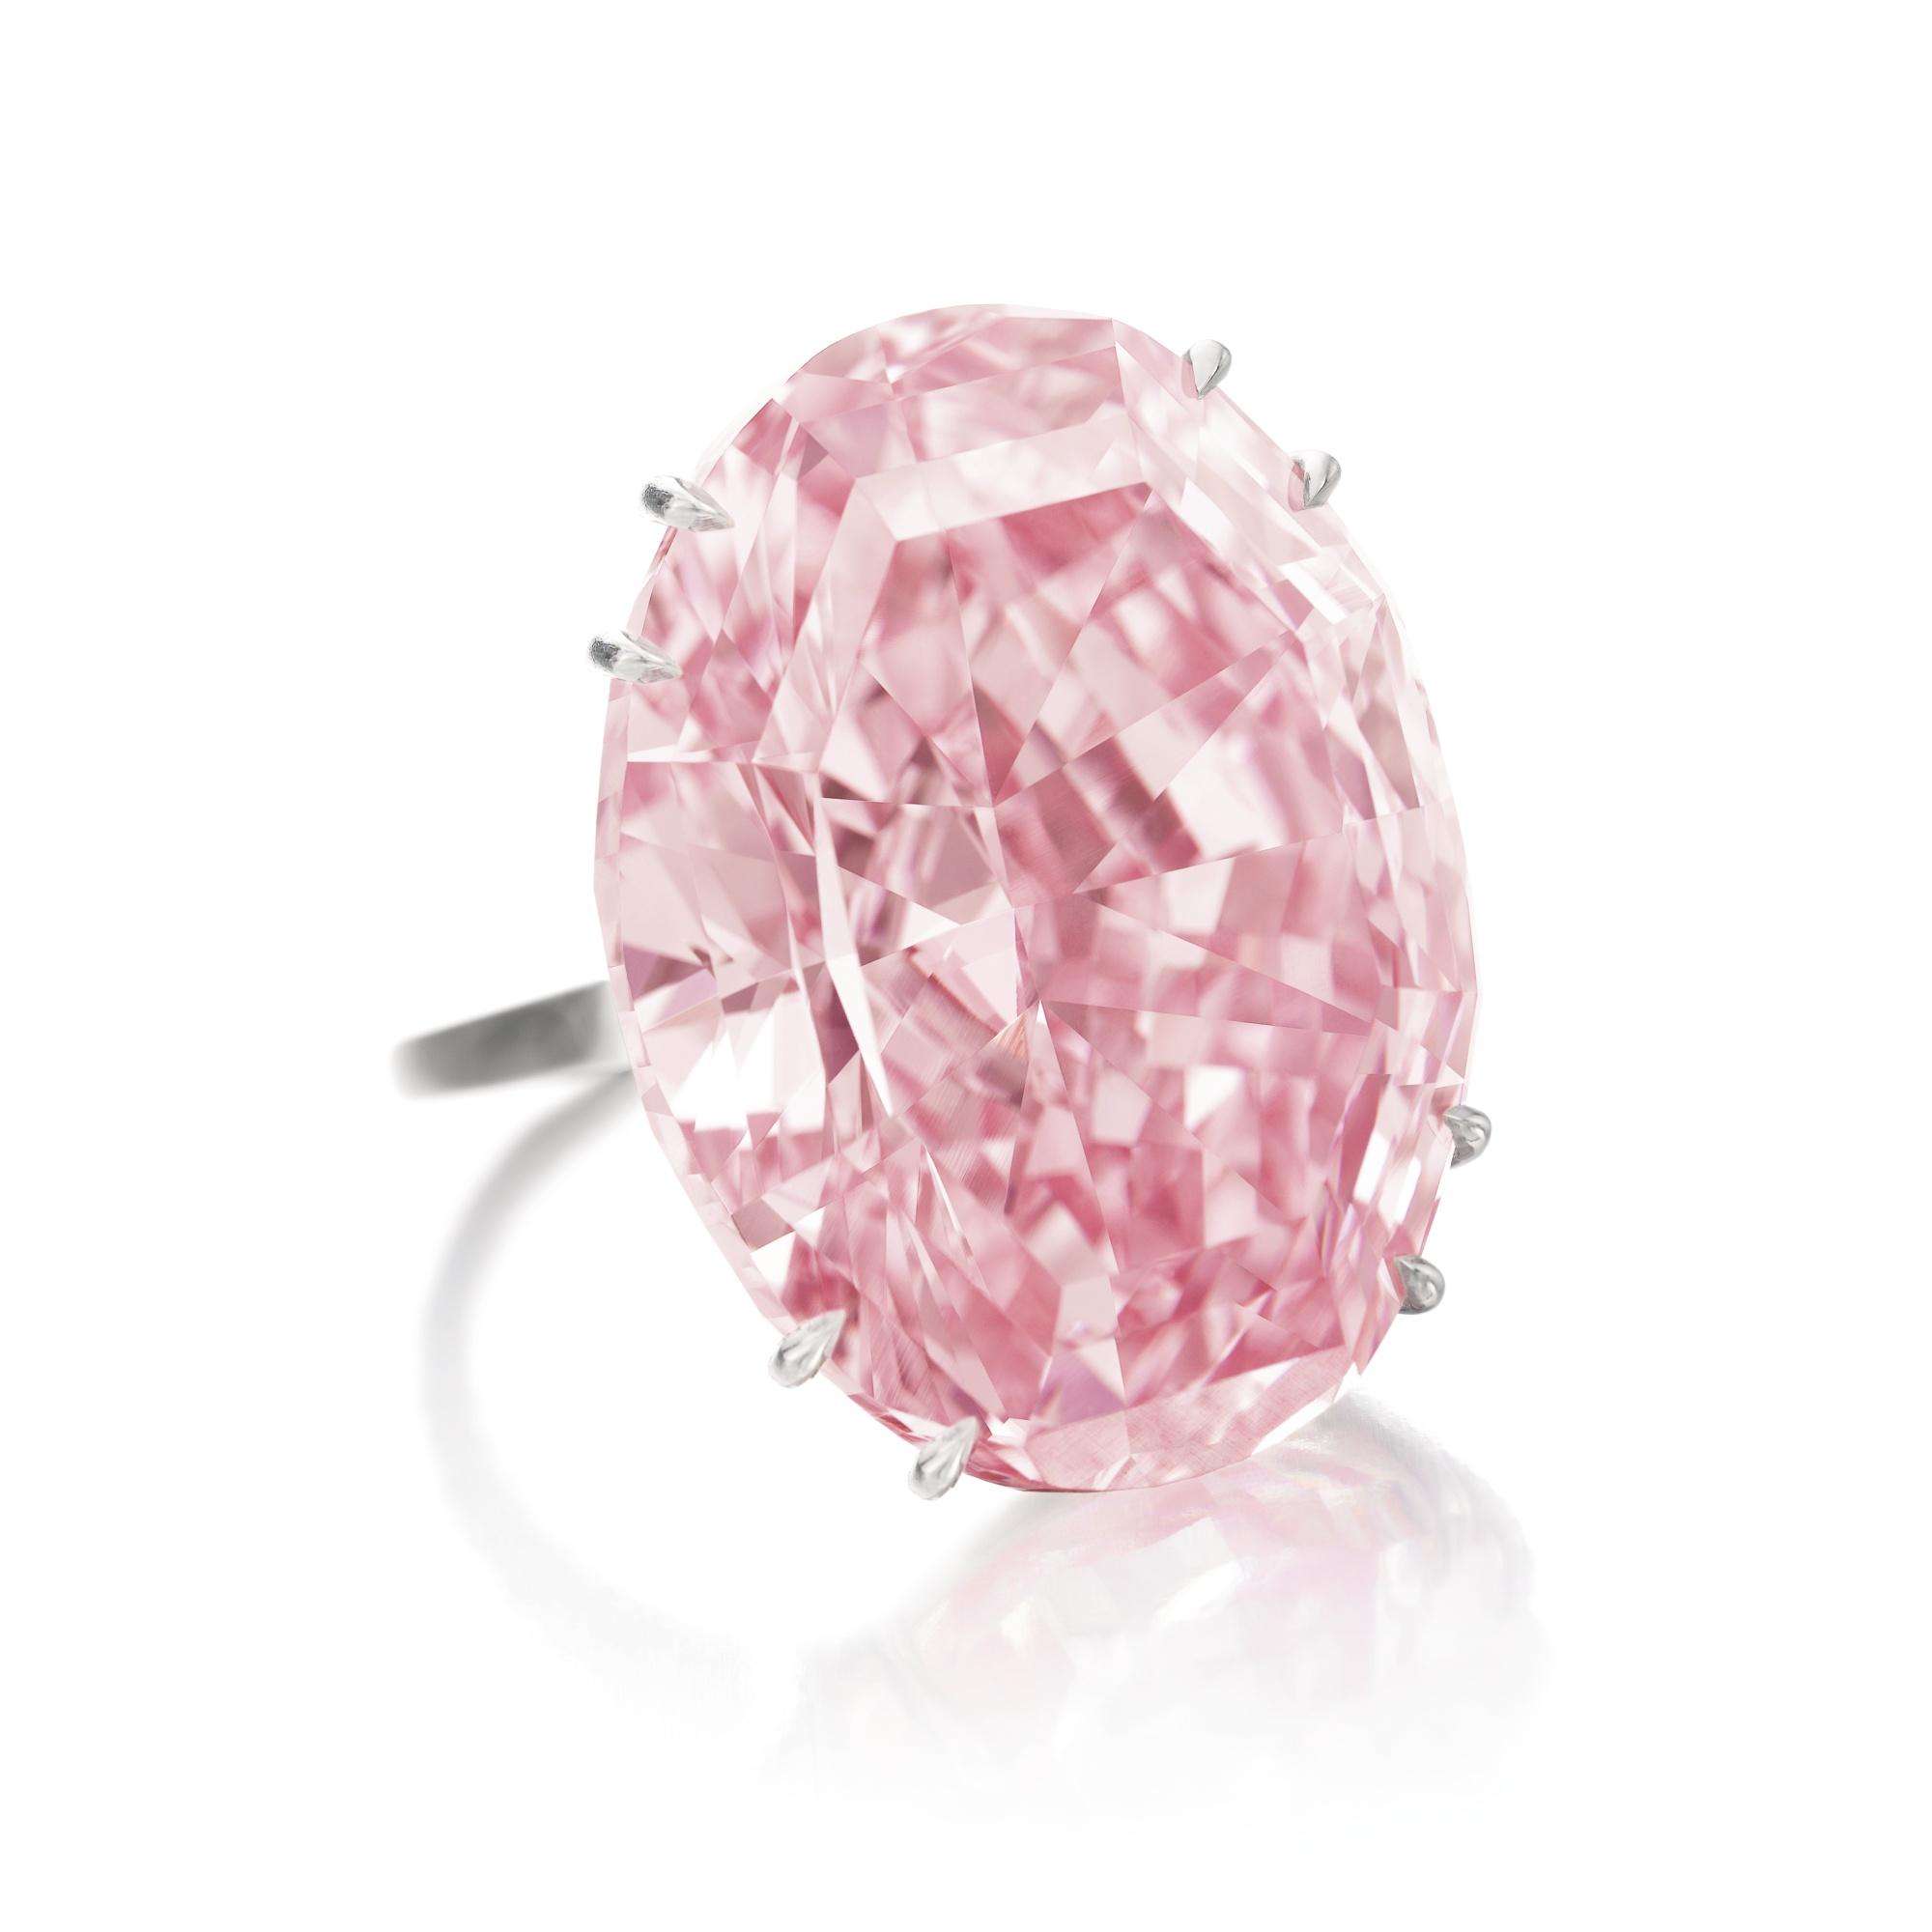 The Rare Graff Pink Diamond